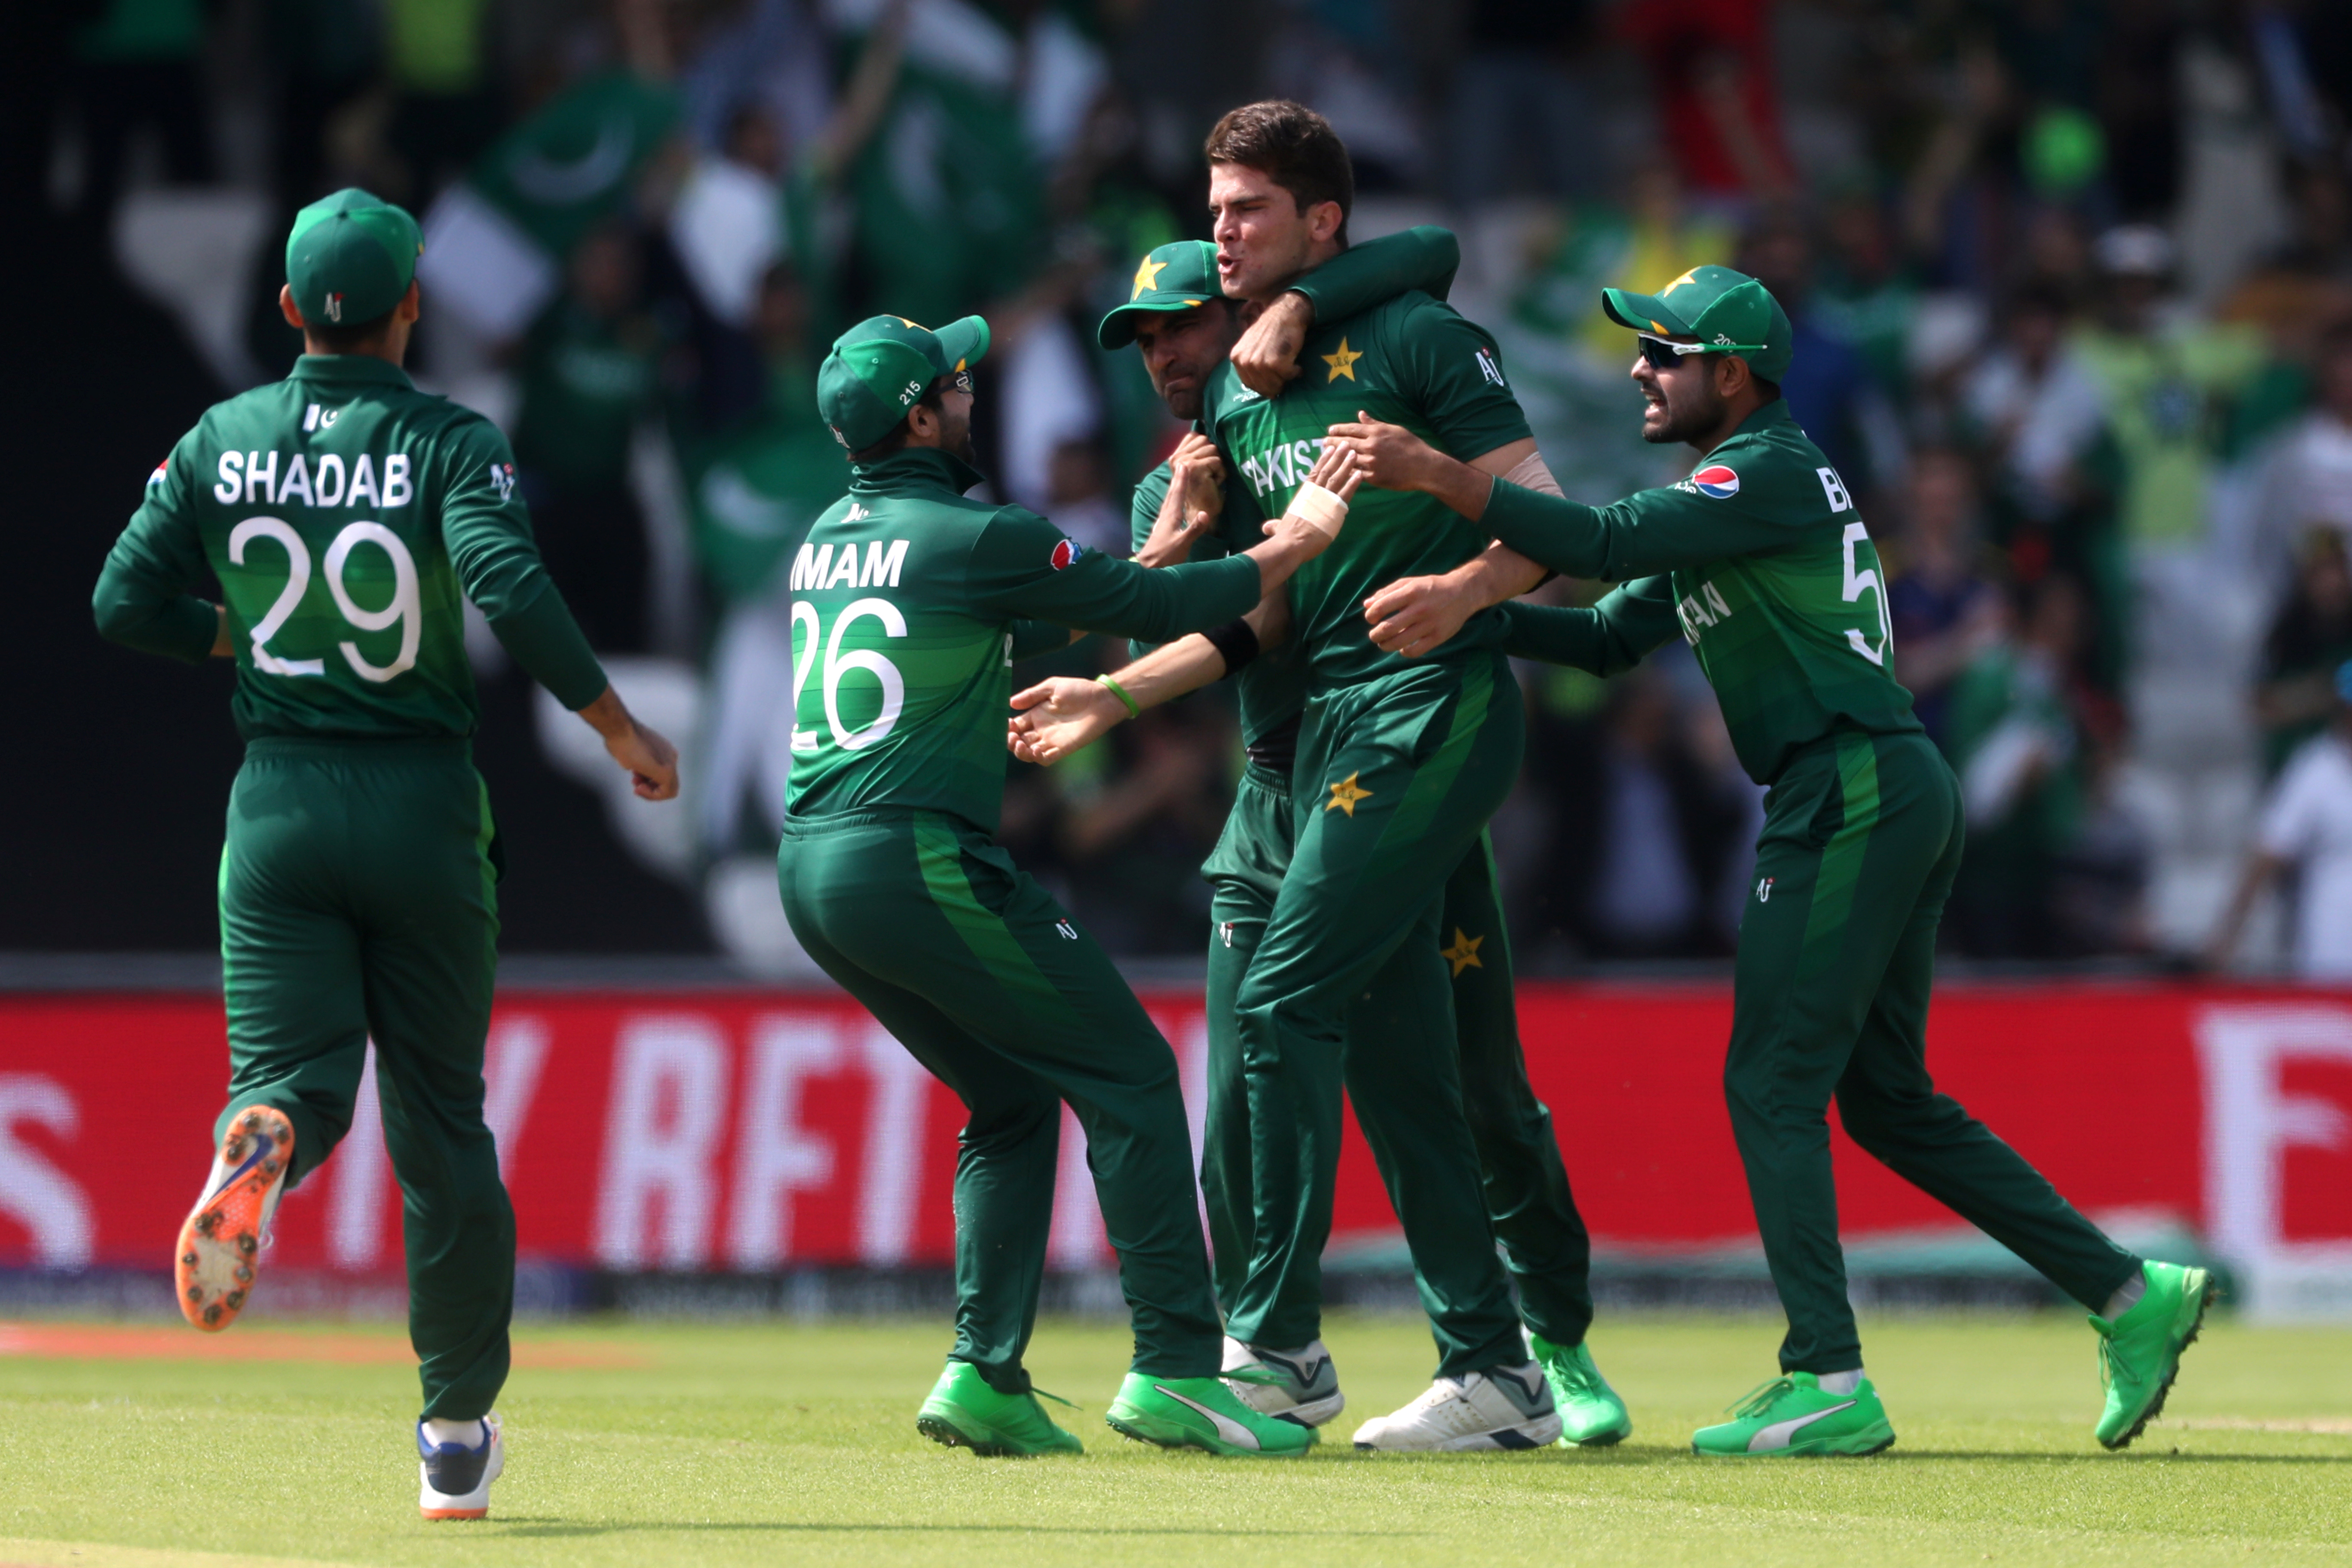 Cricket - ICC Cricket World Cup - Pakistan v Afghanistan - Headingley, Leeds, Britain - June 29, 2019   Pakistan's Shaheen Afridi celebrates taking the wicket of Afghanistan's Hashmatullah Shahidi   Action Images via Reuters/Lee Smith